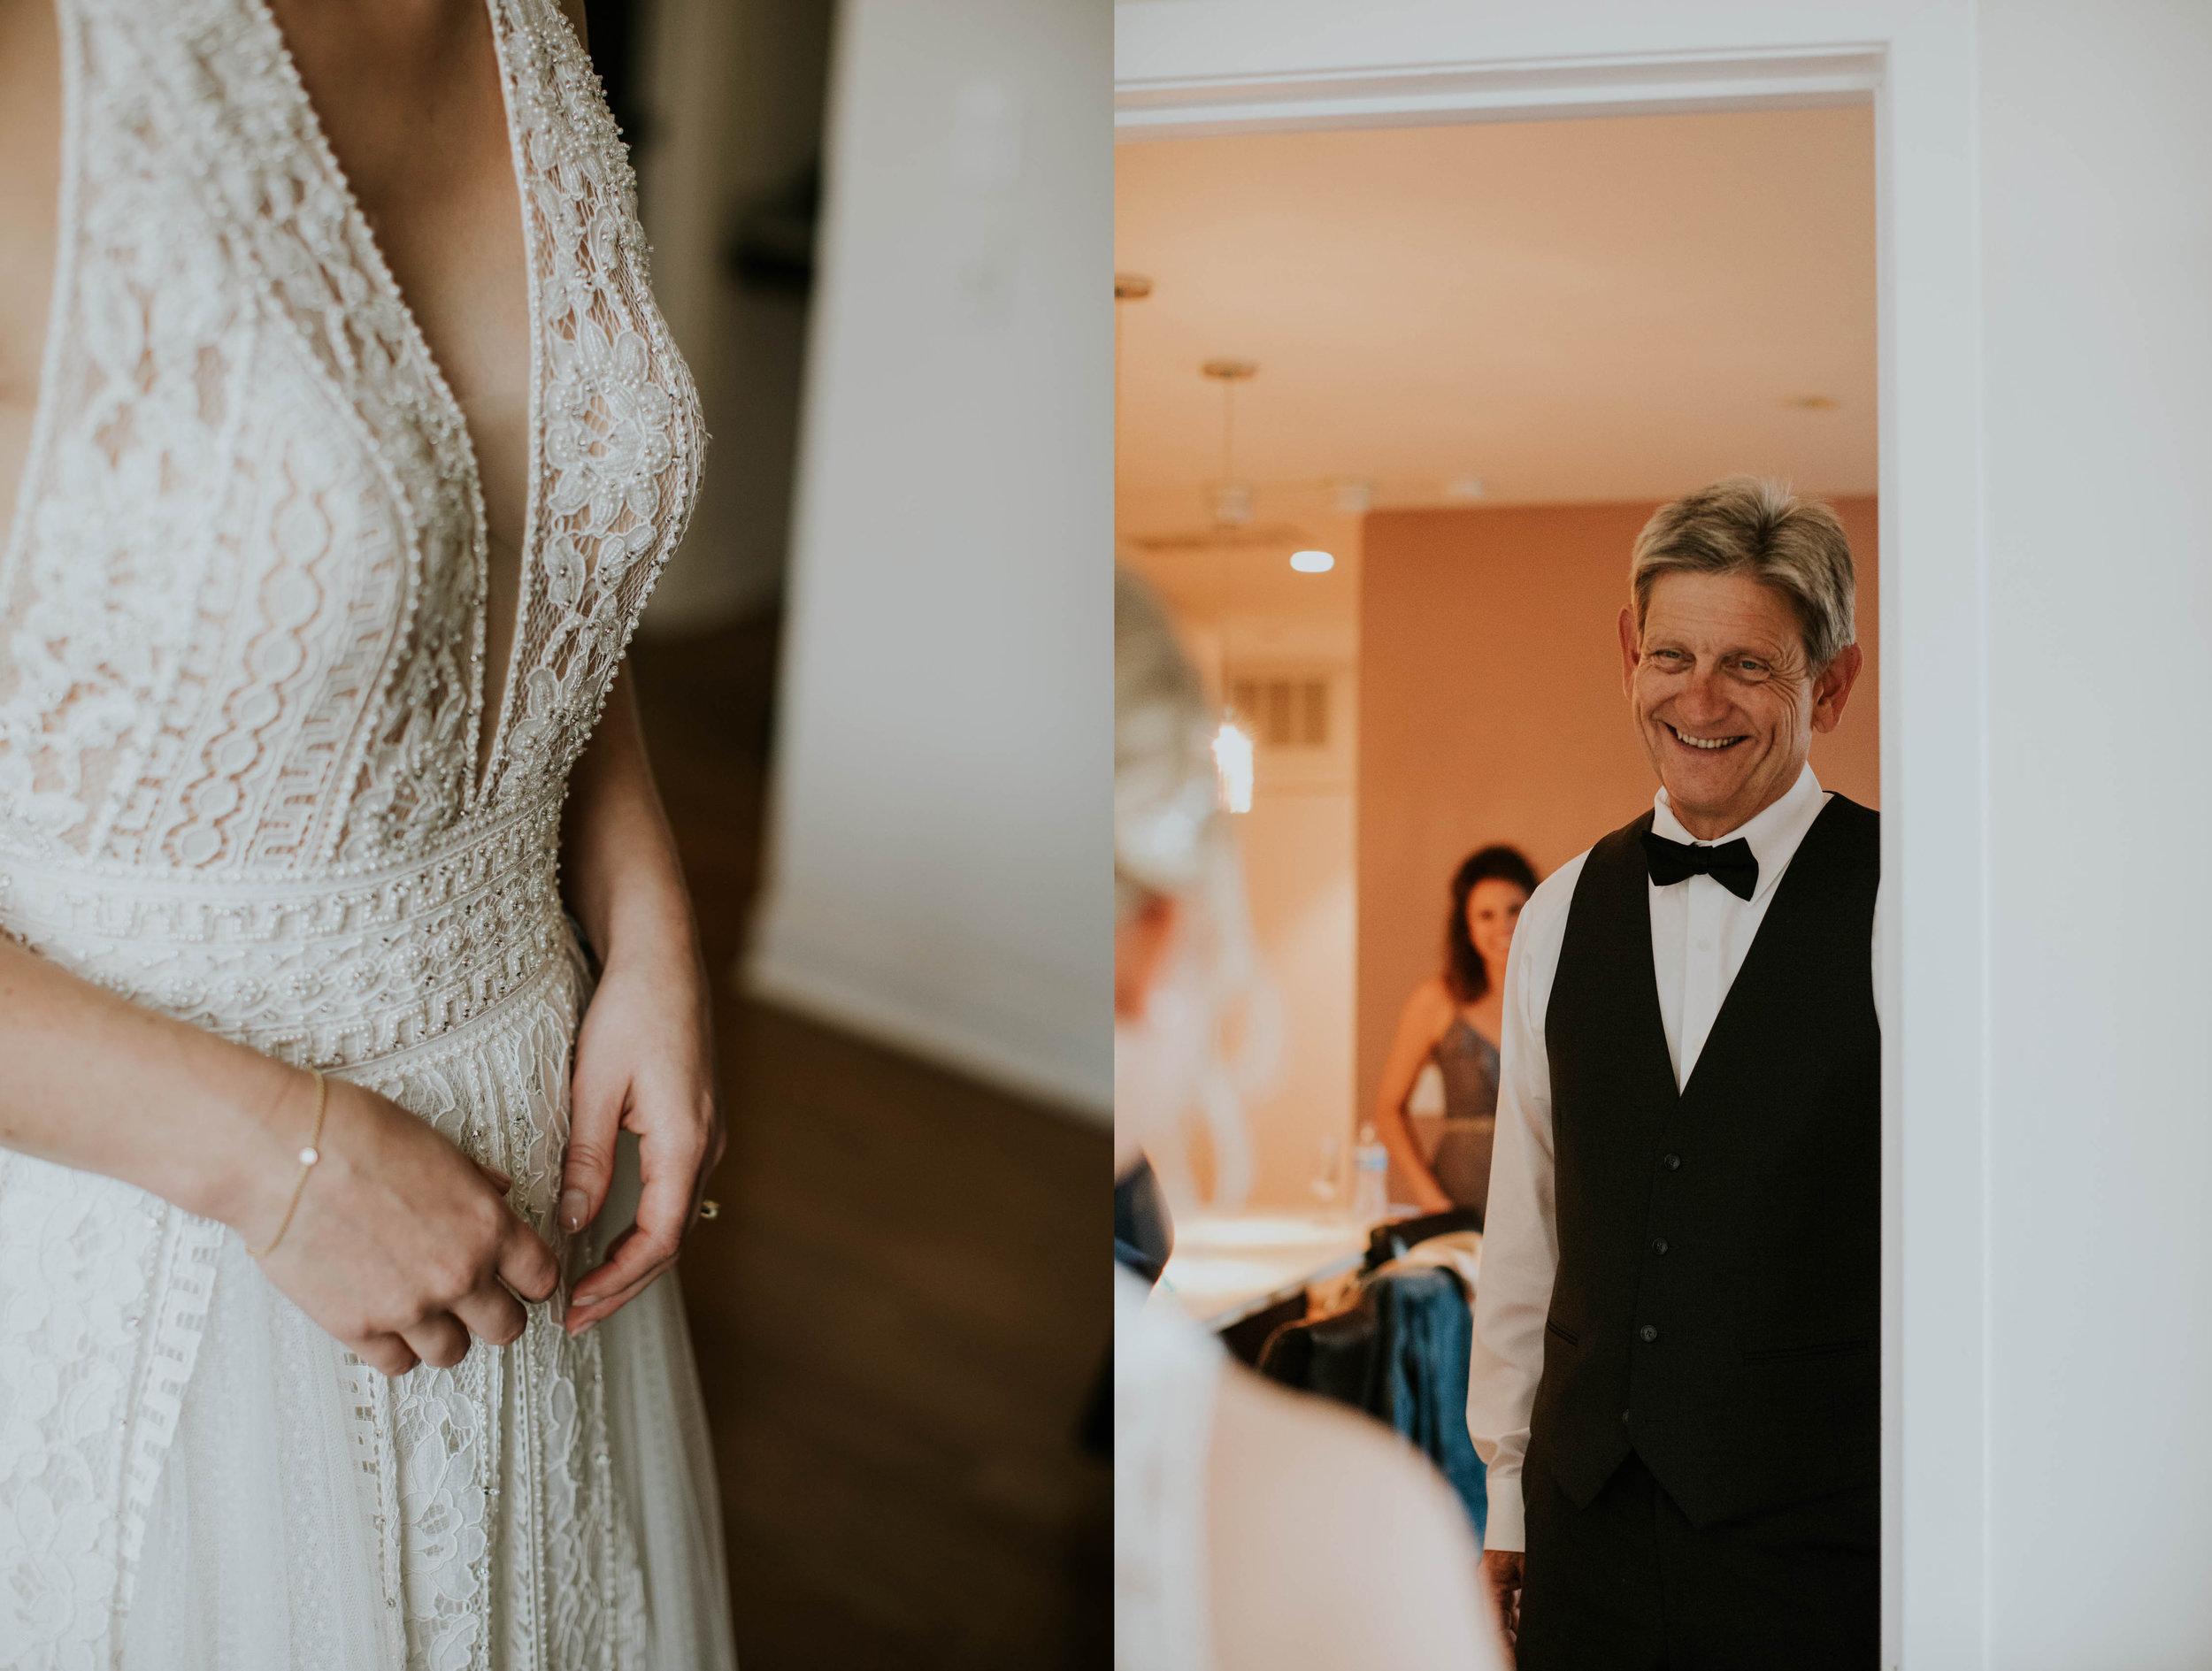 Jenero Wedding 100618-112 copy.jpg